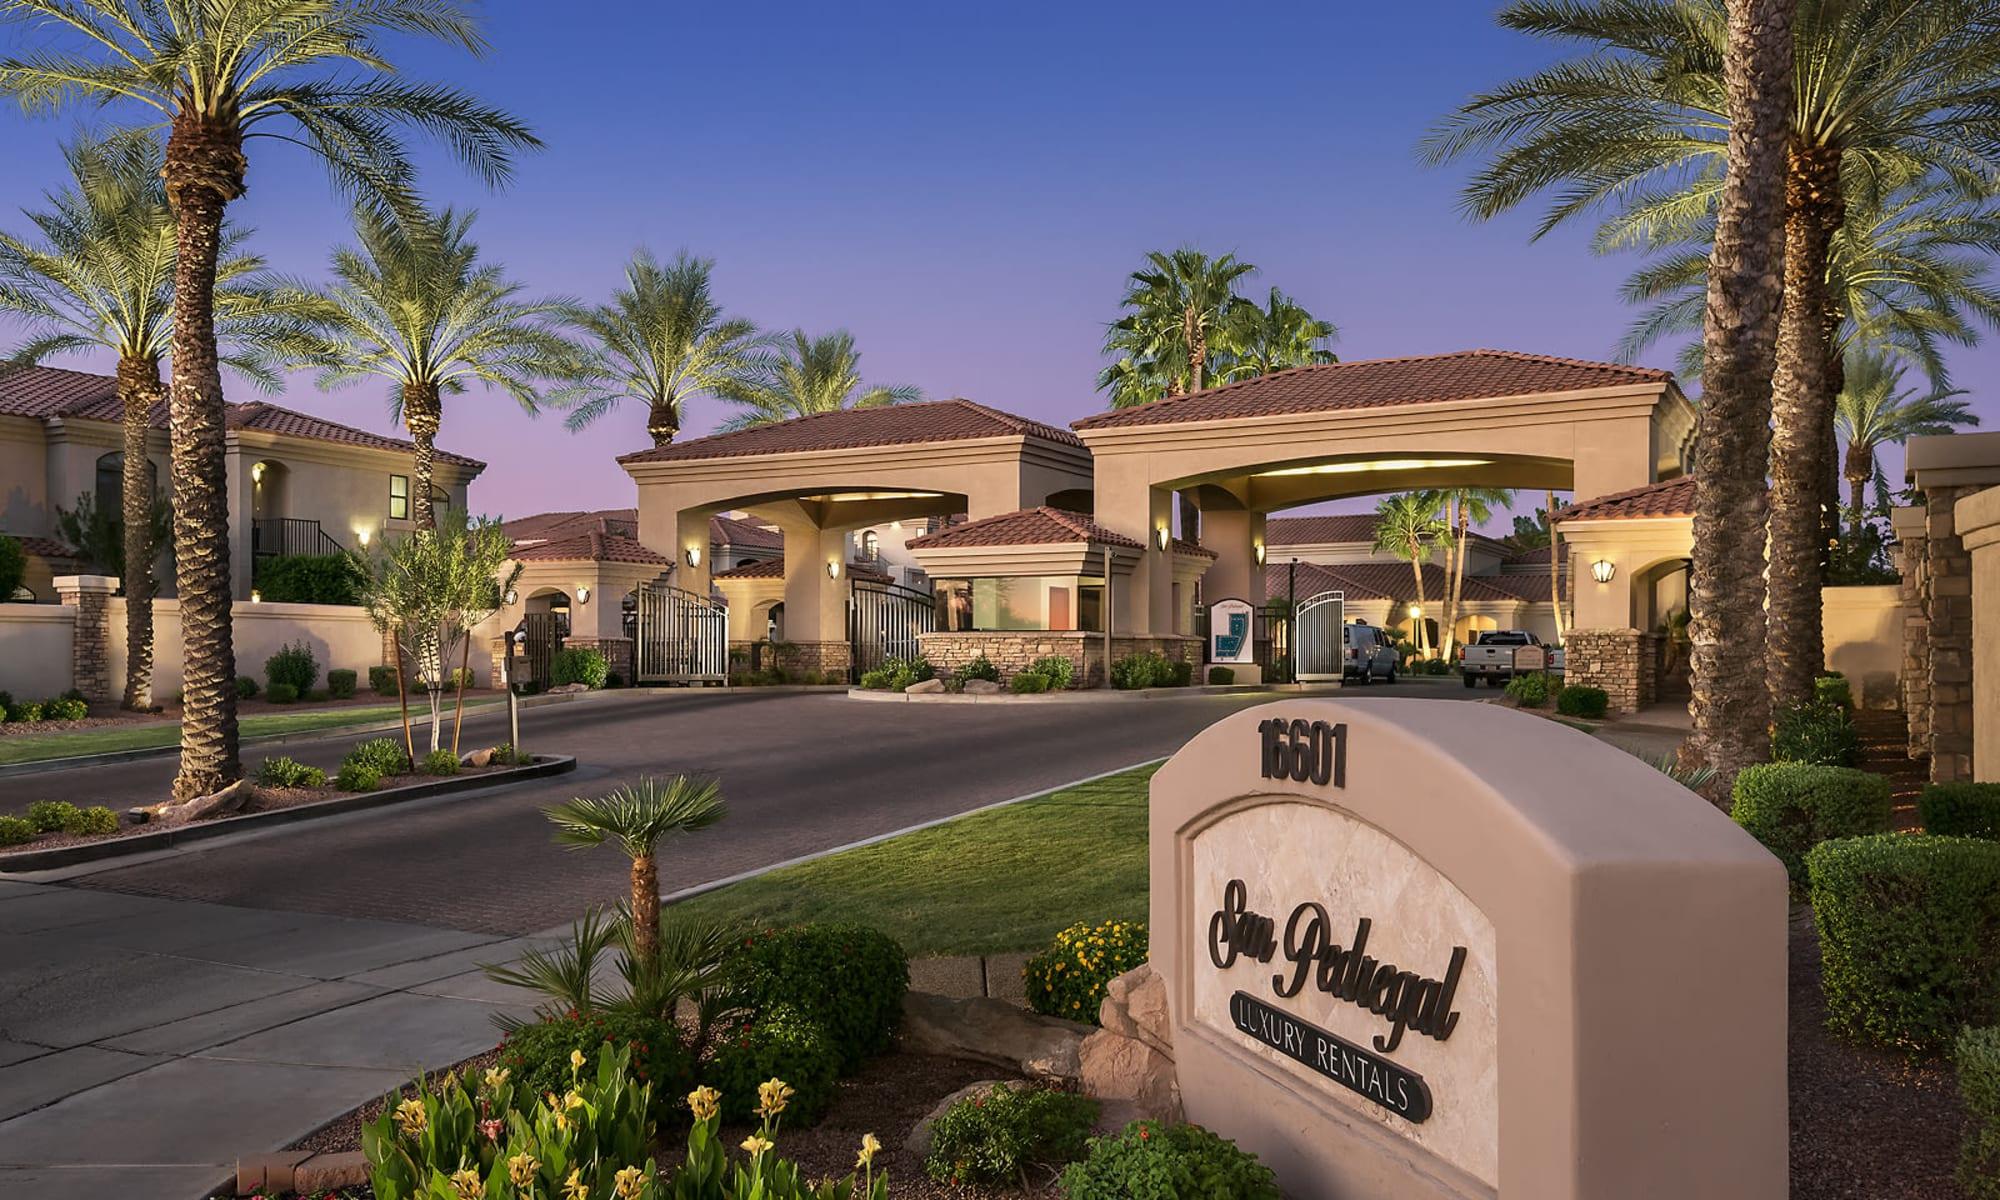 Apartments at San Pedregal in Phoenix, Arizona